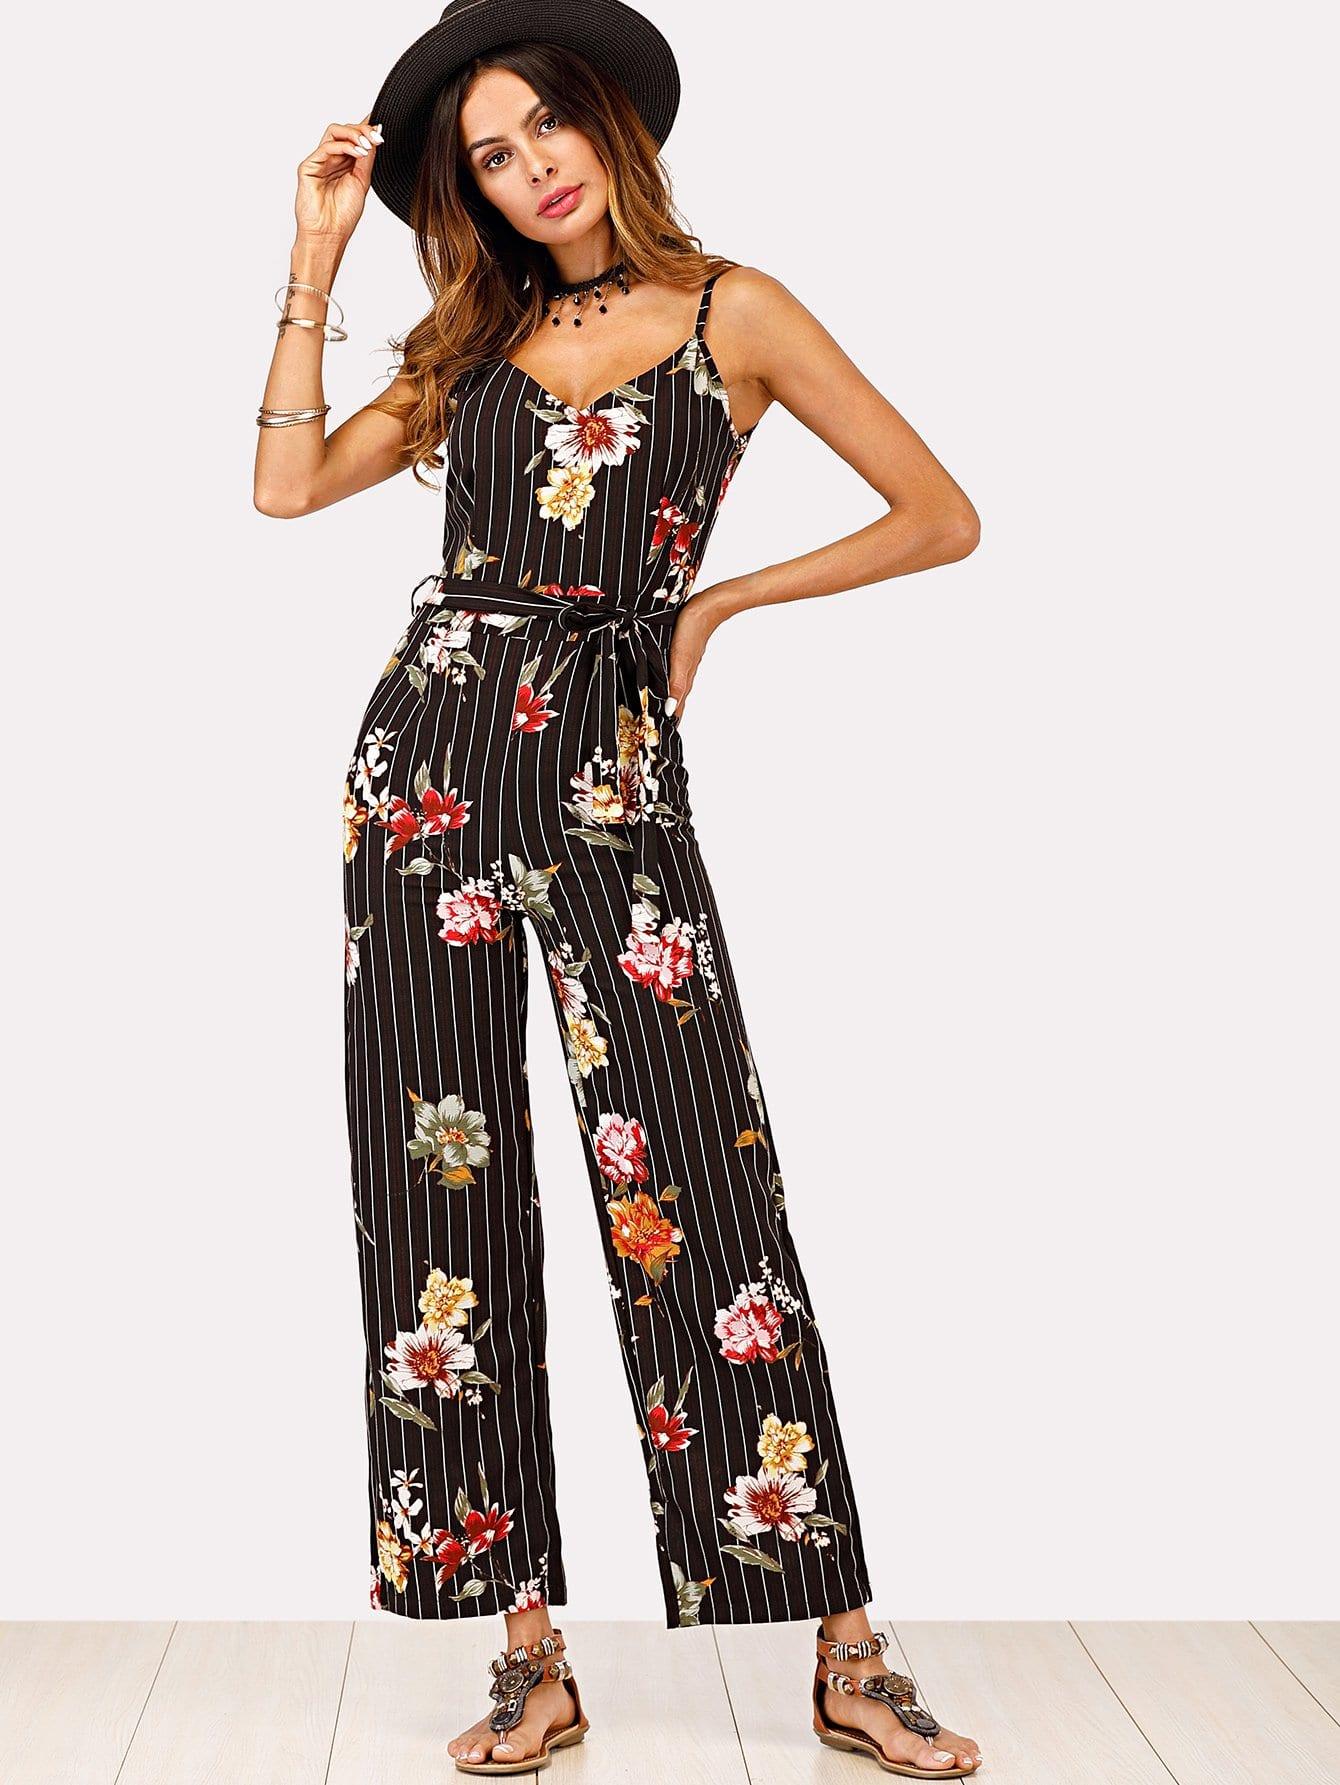 Floral Print Striped Self Tie Waist Jumpsuit striped ruffled waist self tie pants